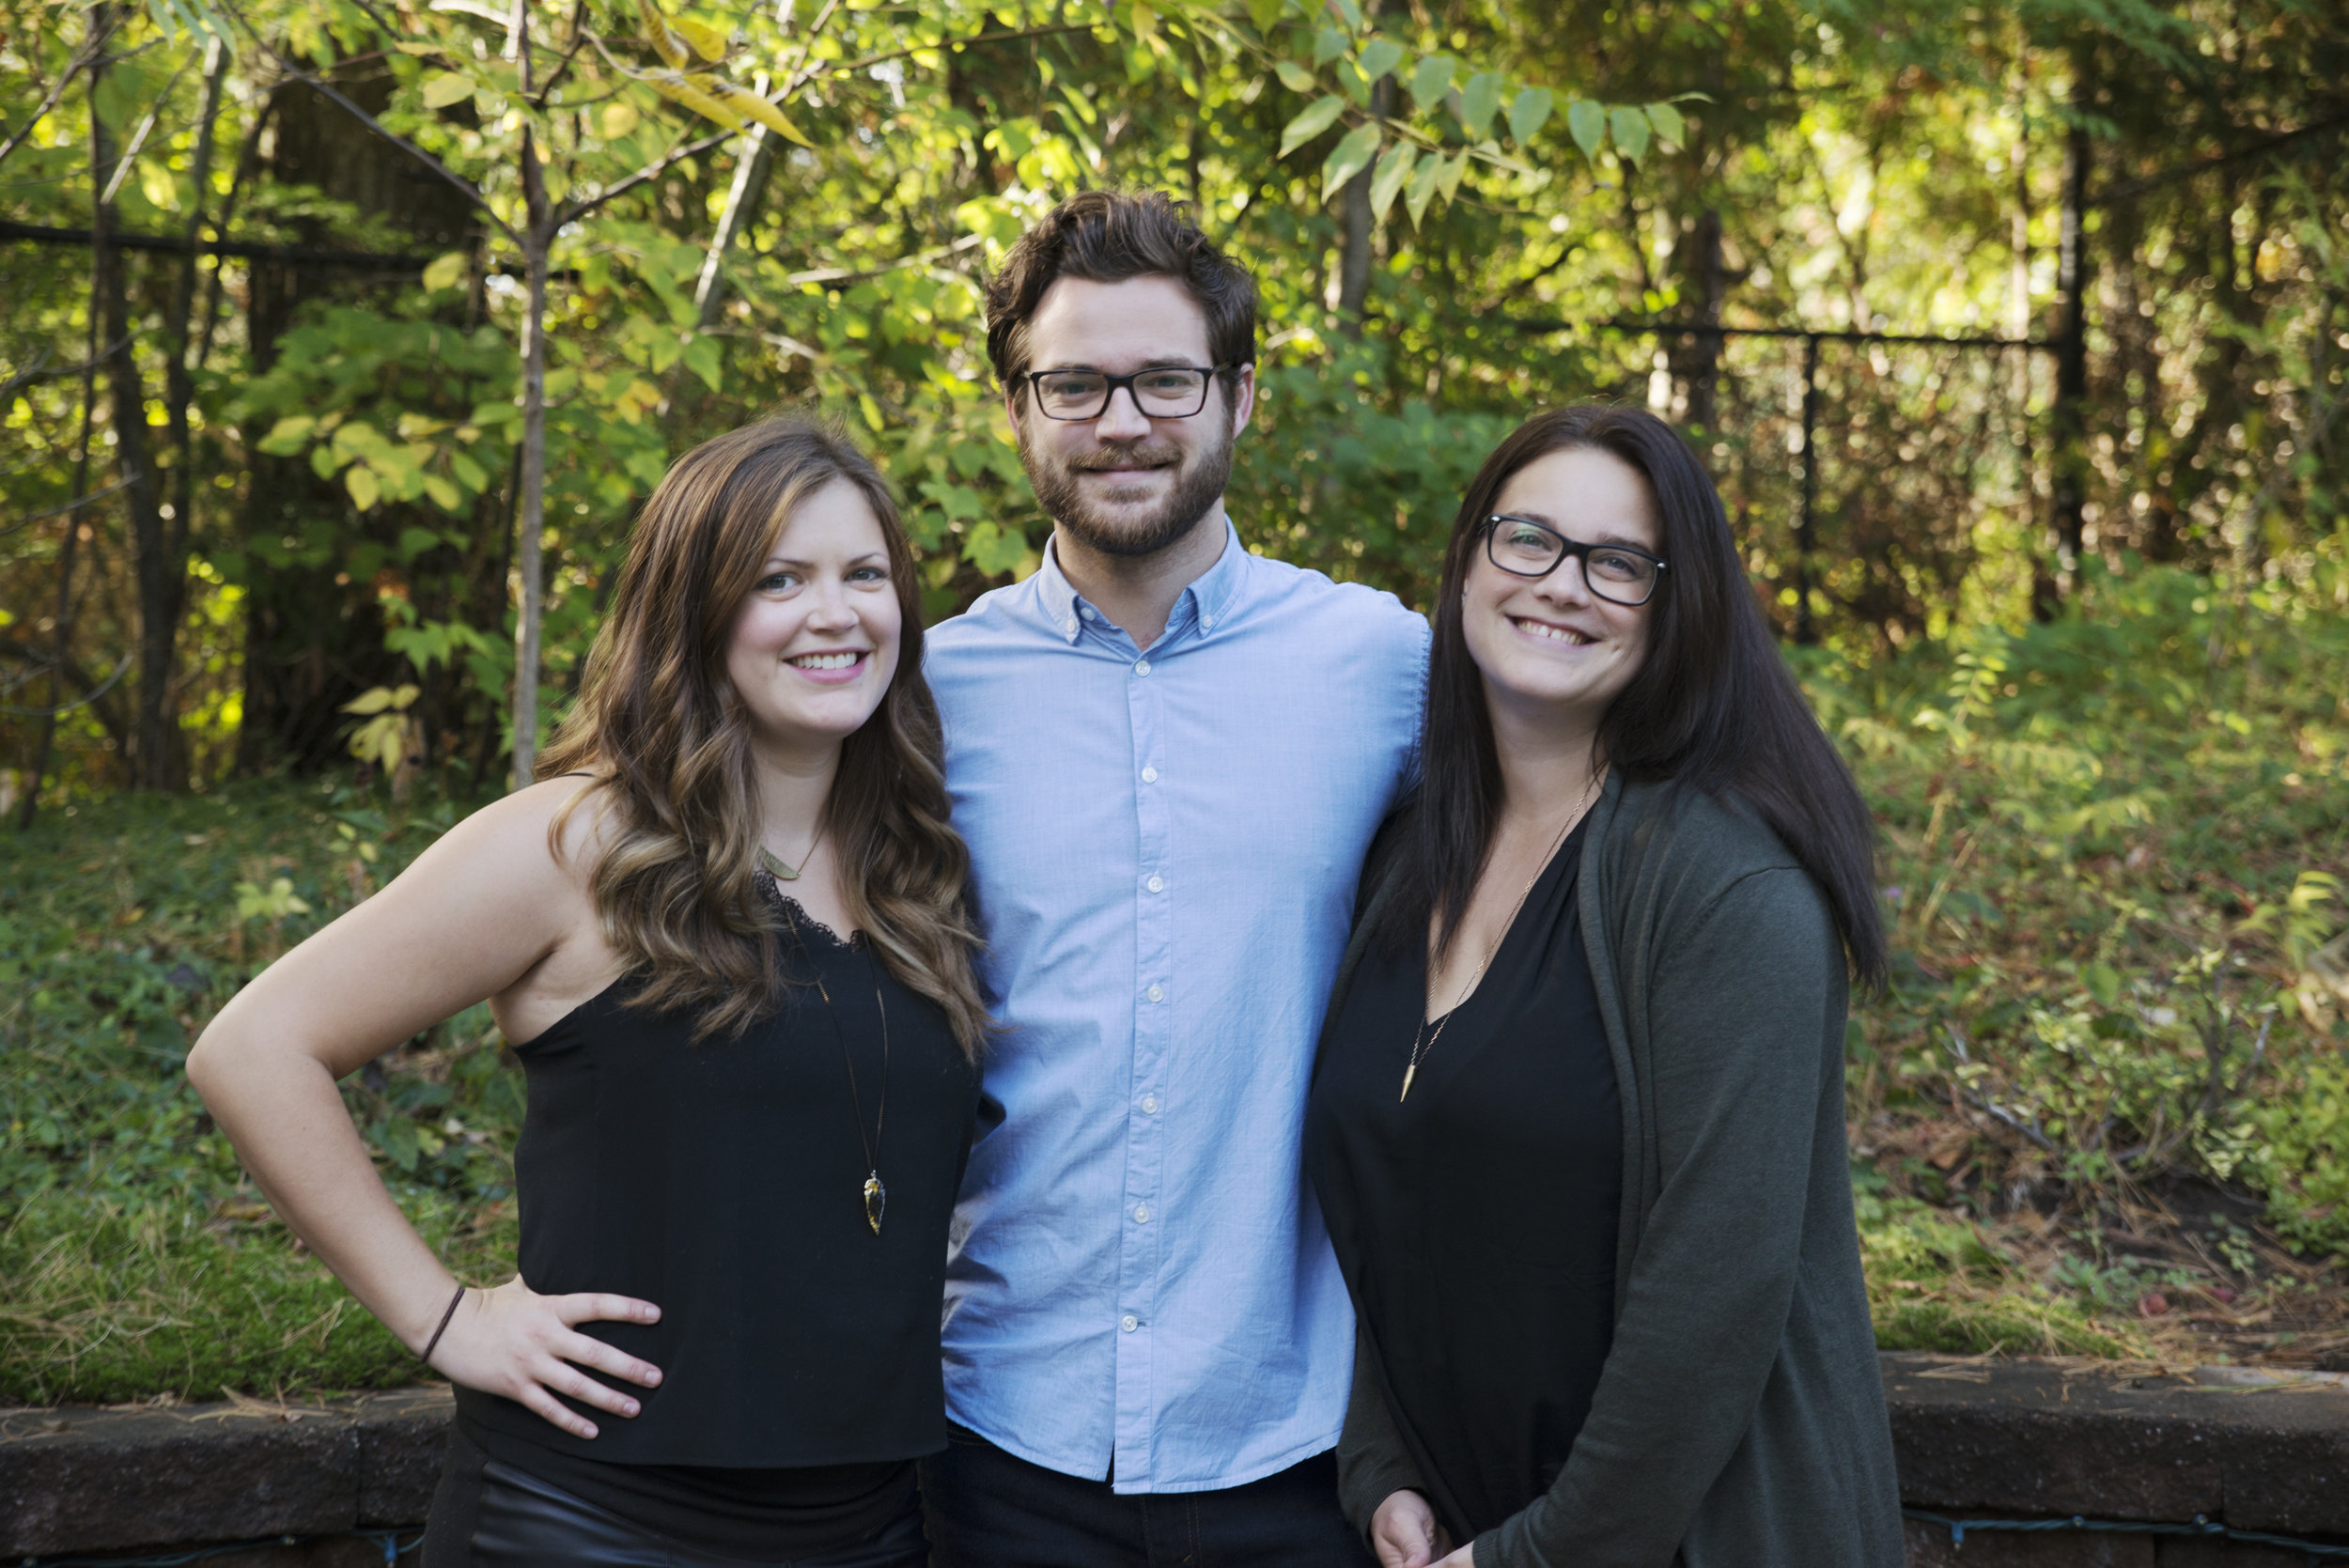 RosewoodWeddingPhotos-Family-TorontoFamilyPhotographer-Pickering-ExtendedFamily